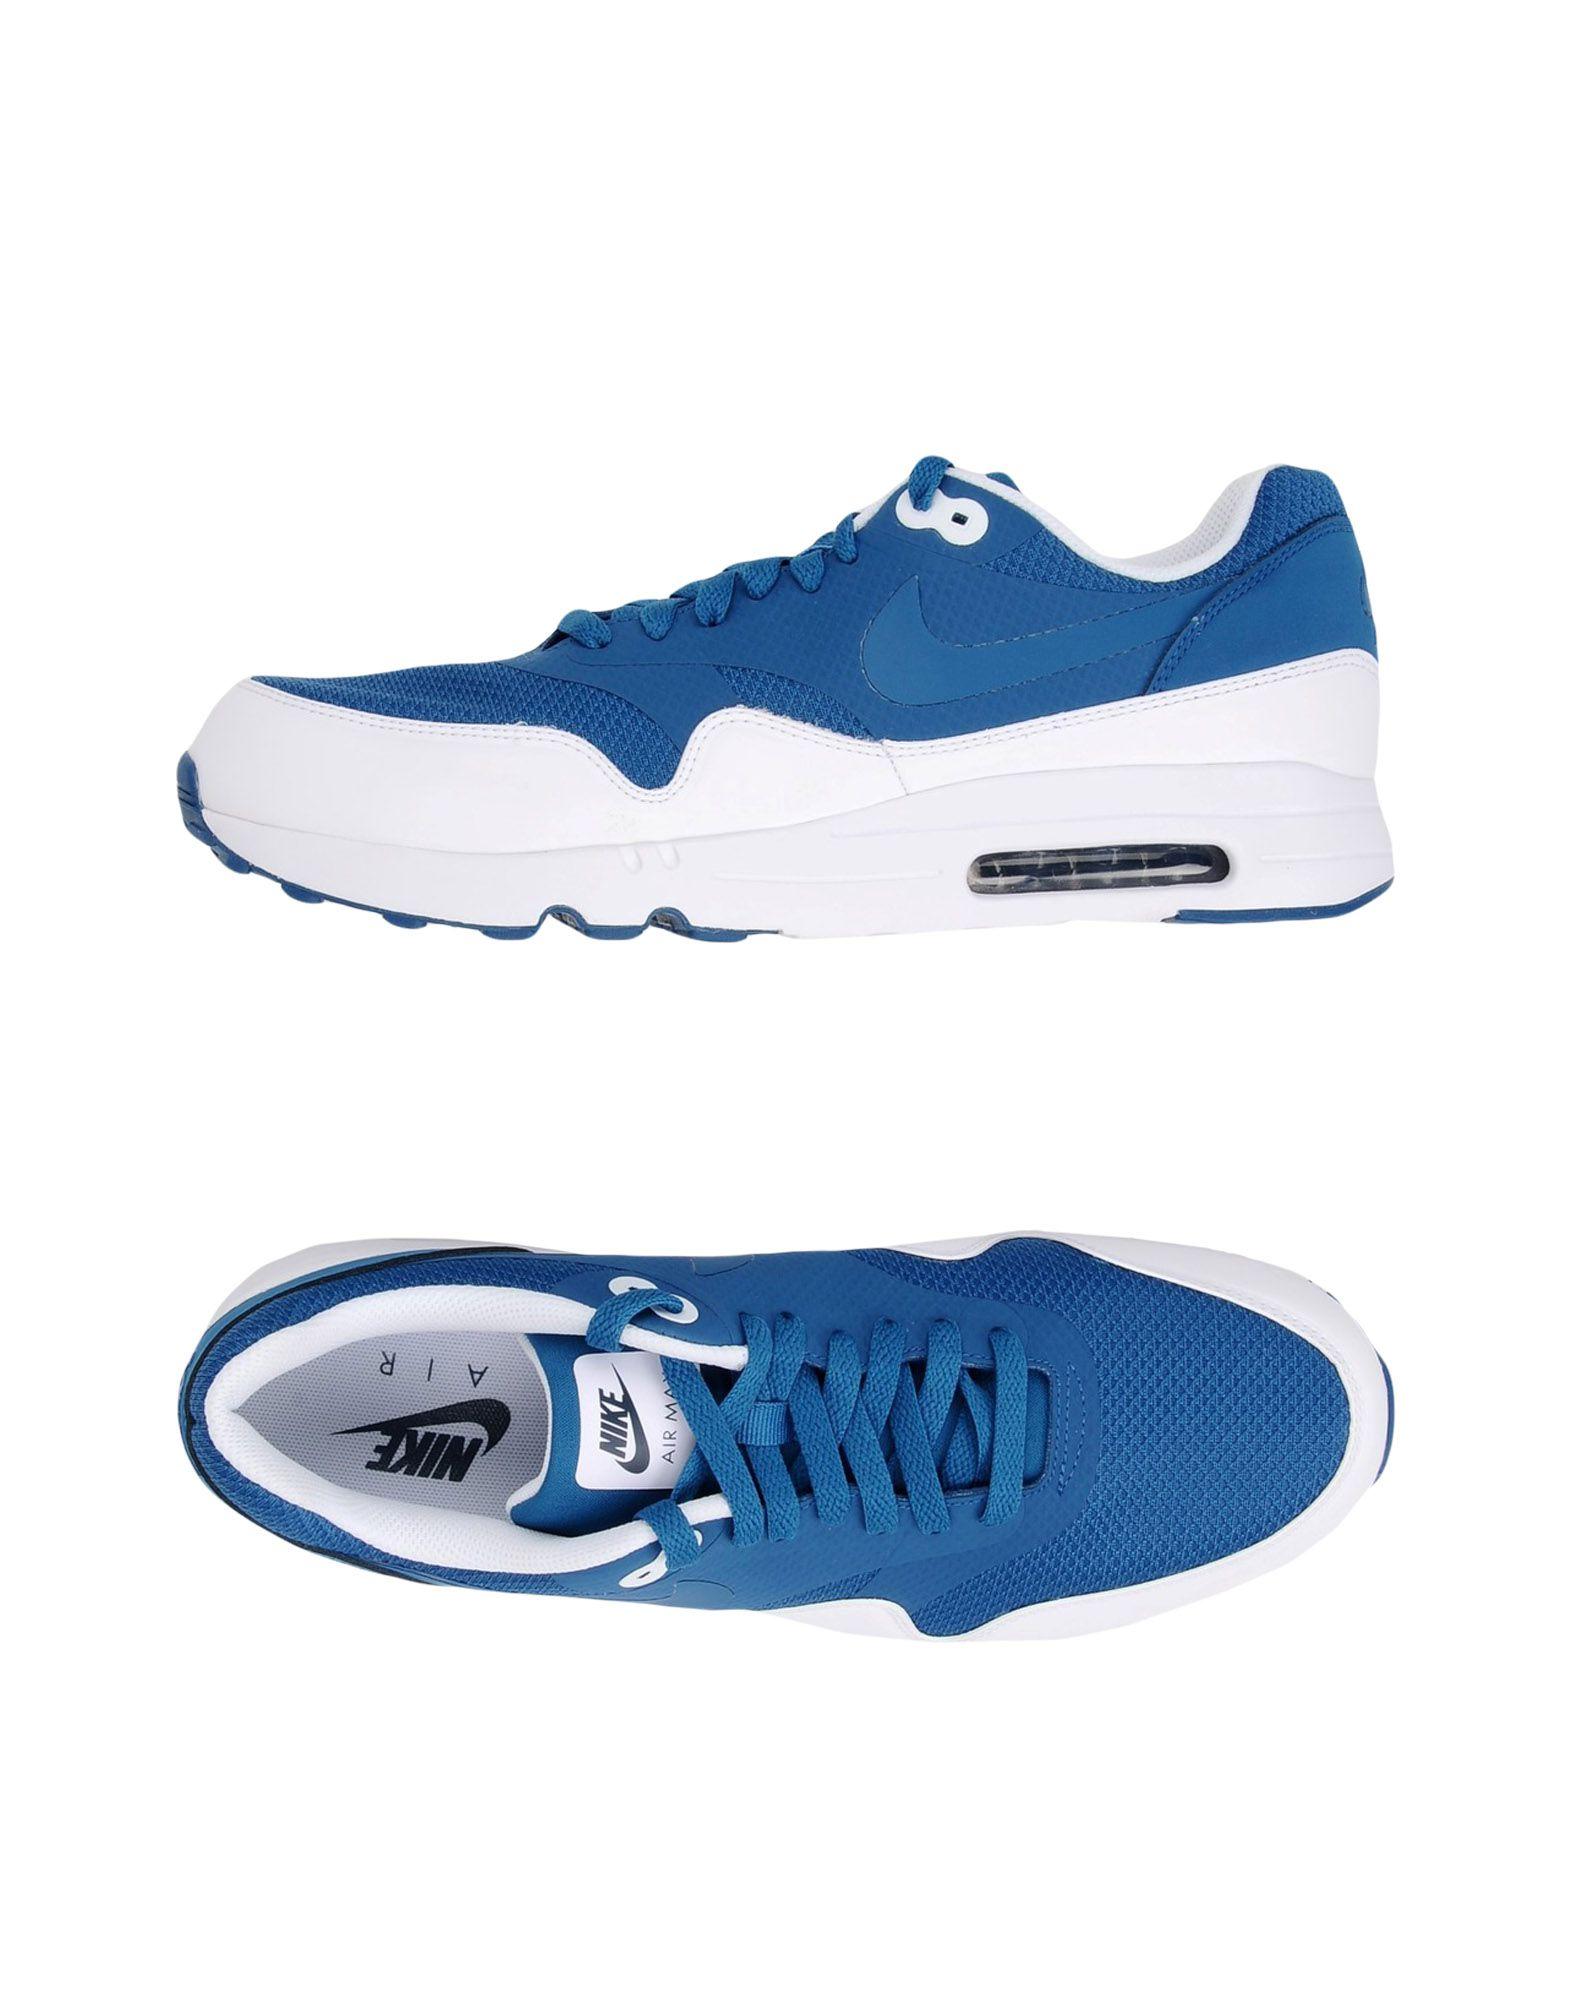 Rabatt Max echte Schuhe Nike Air Max Rabatt 1 Ultra 2.0 Essential  11292336QO 187b23